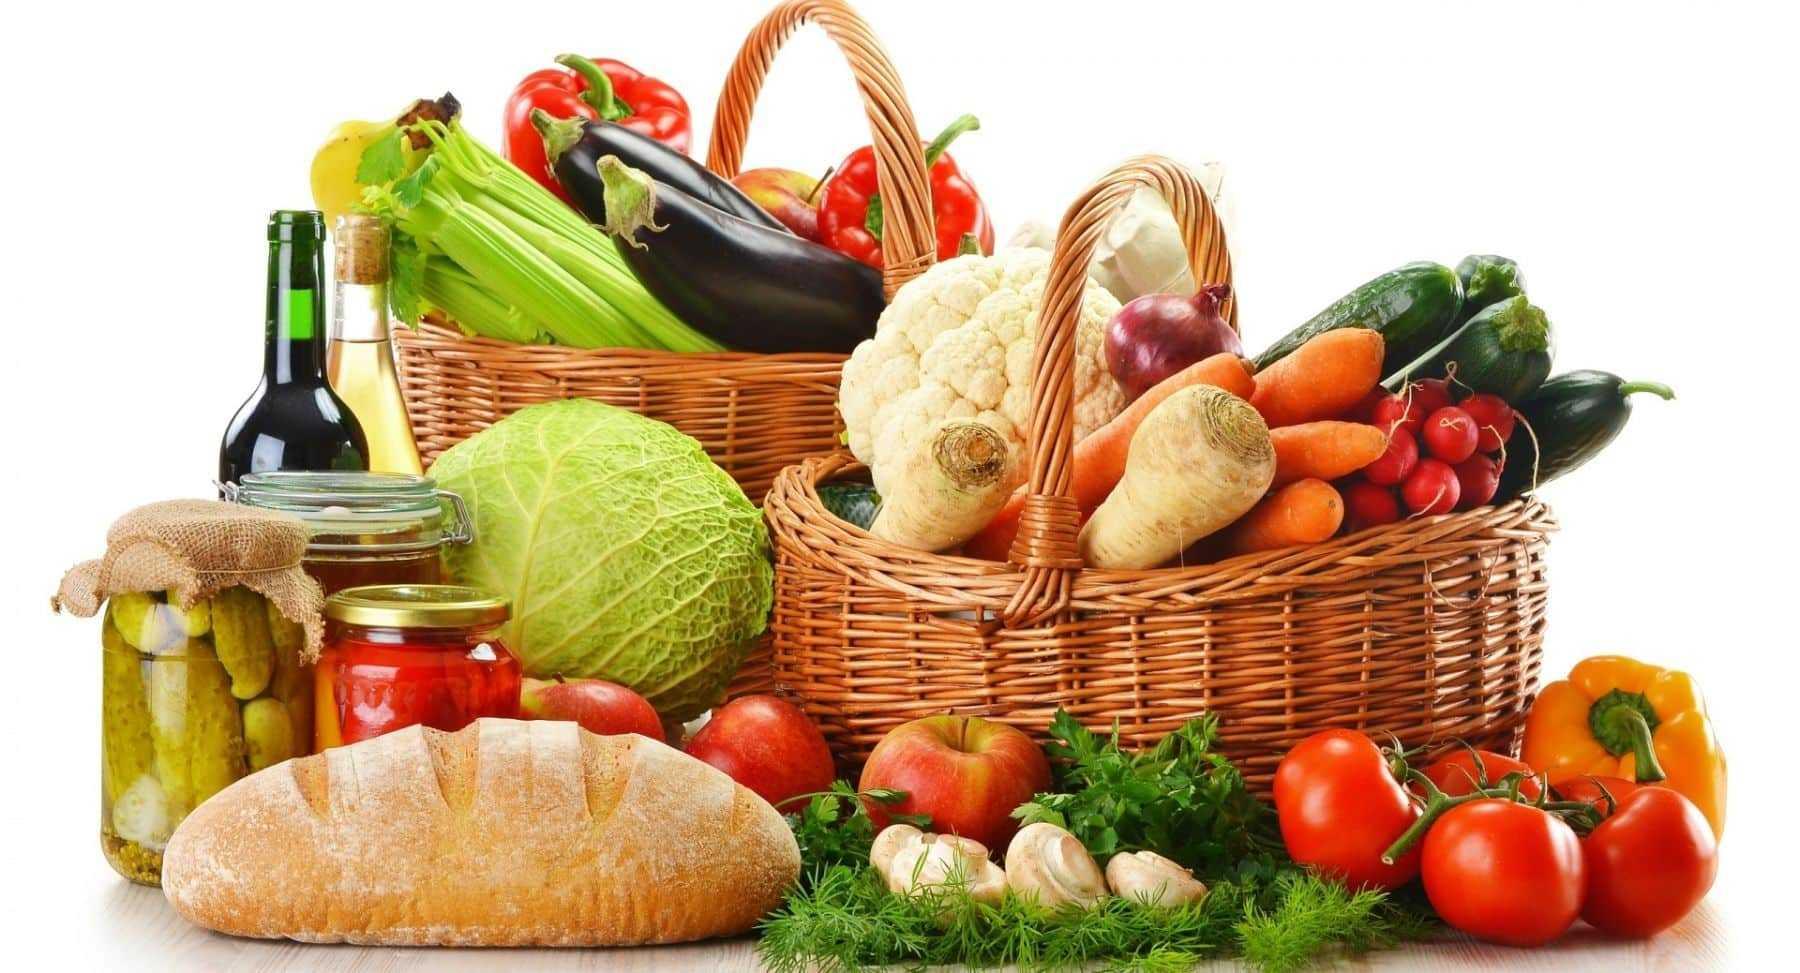 Sag%CC%86l%C4%B1kl%C4%B1 ve Dengeli Beslenme O%CC%88nerileri 1